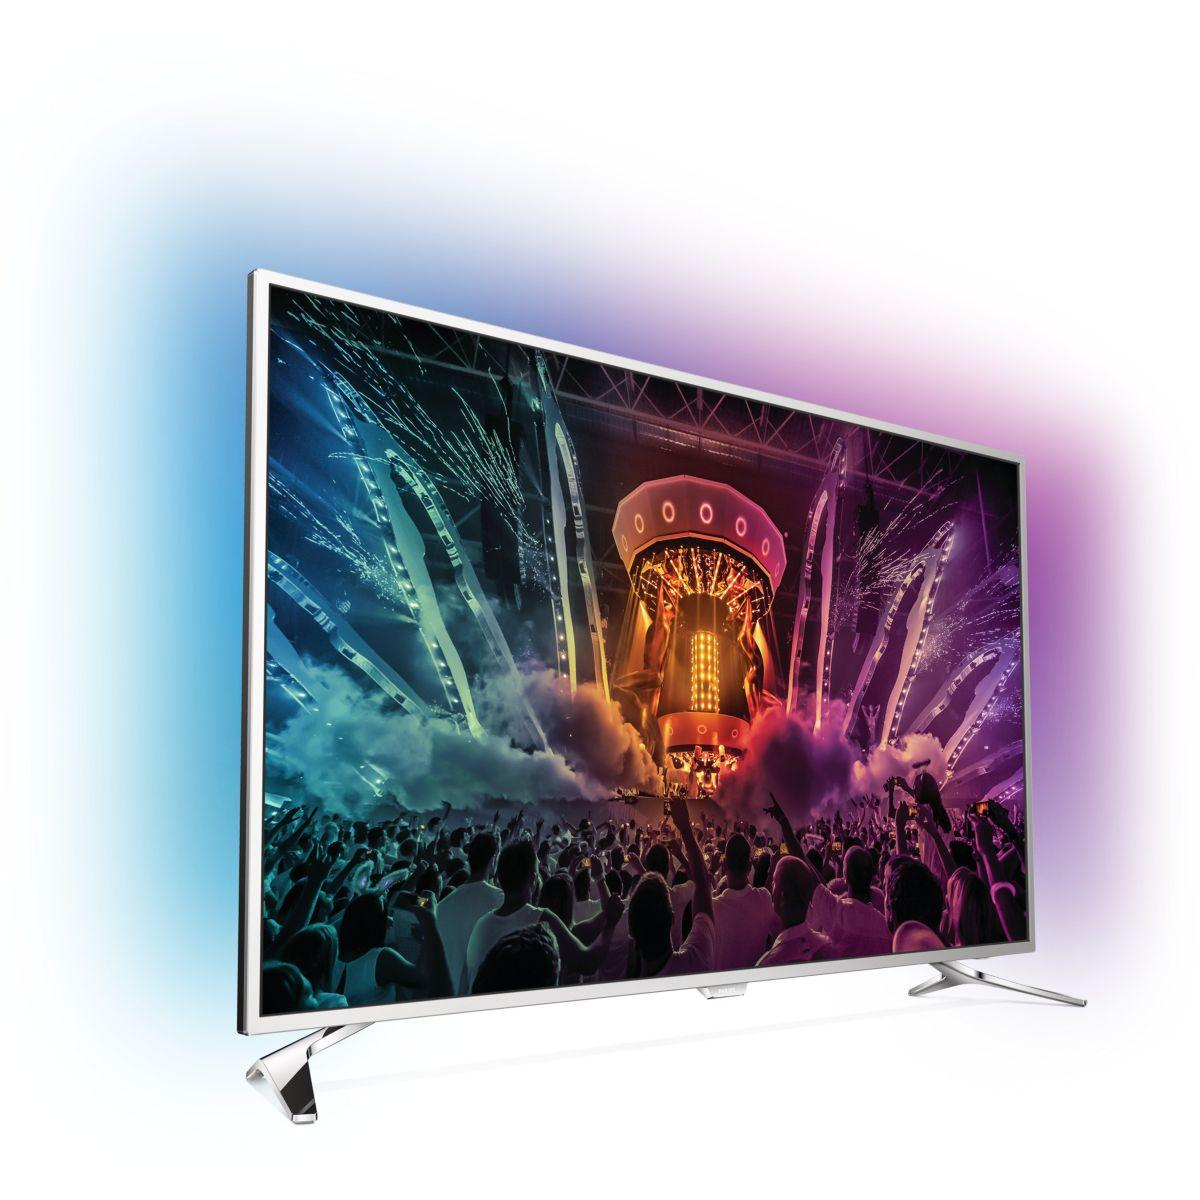 TV PHILIPS 49PUS6561 4K 1800 PPI SMART TV